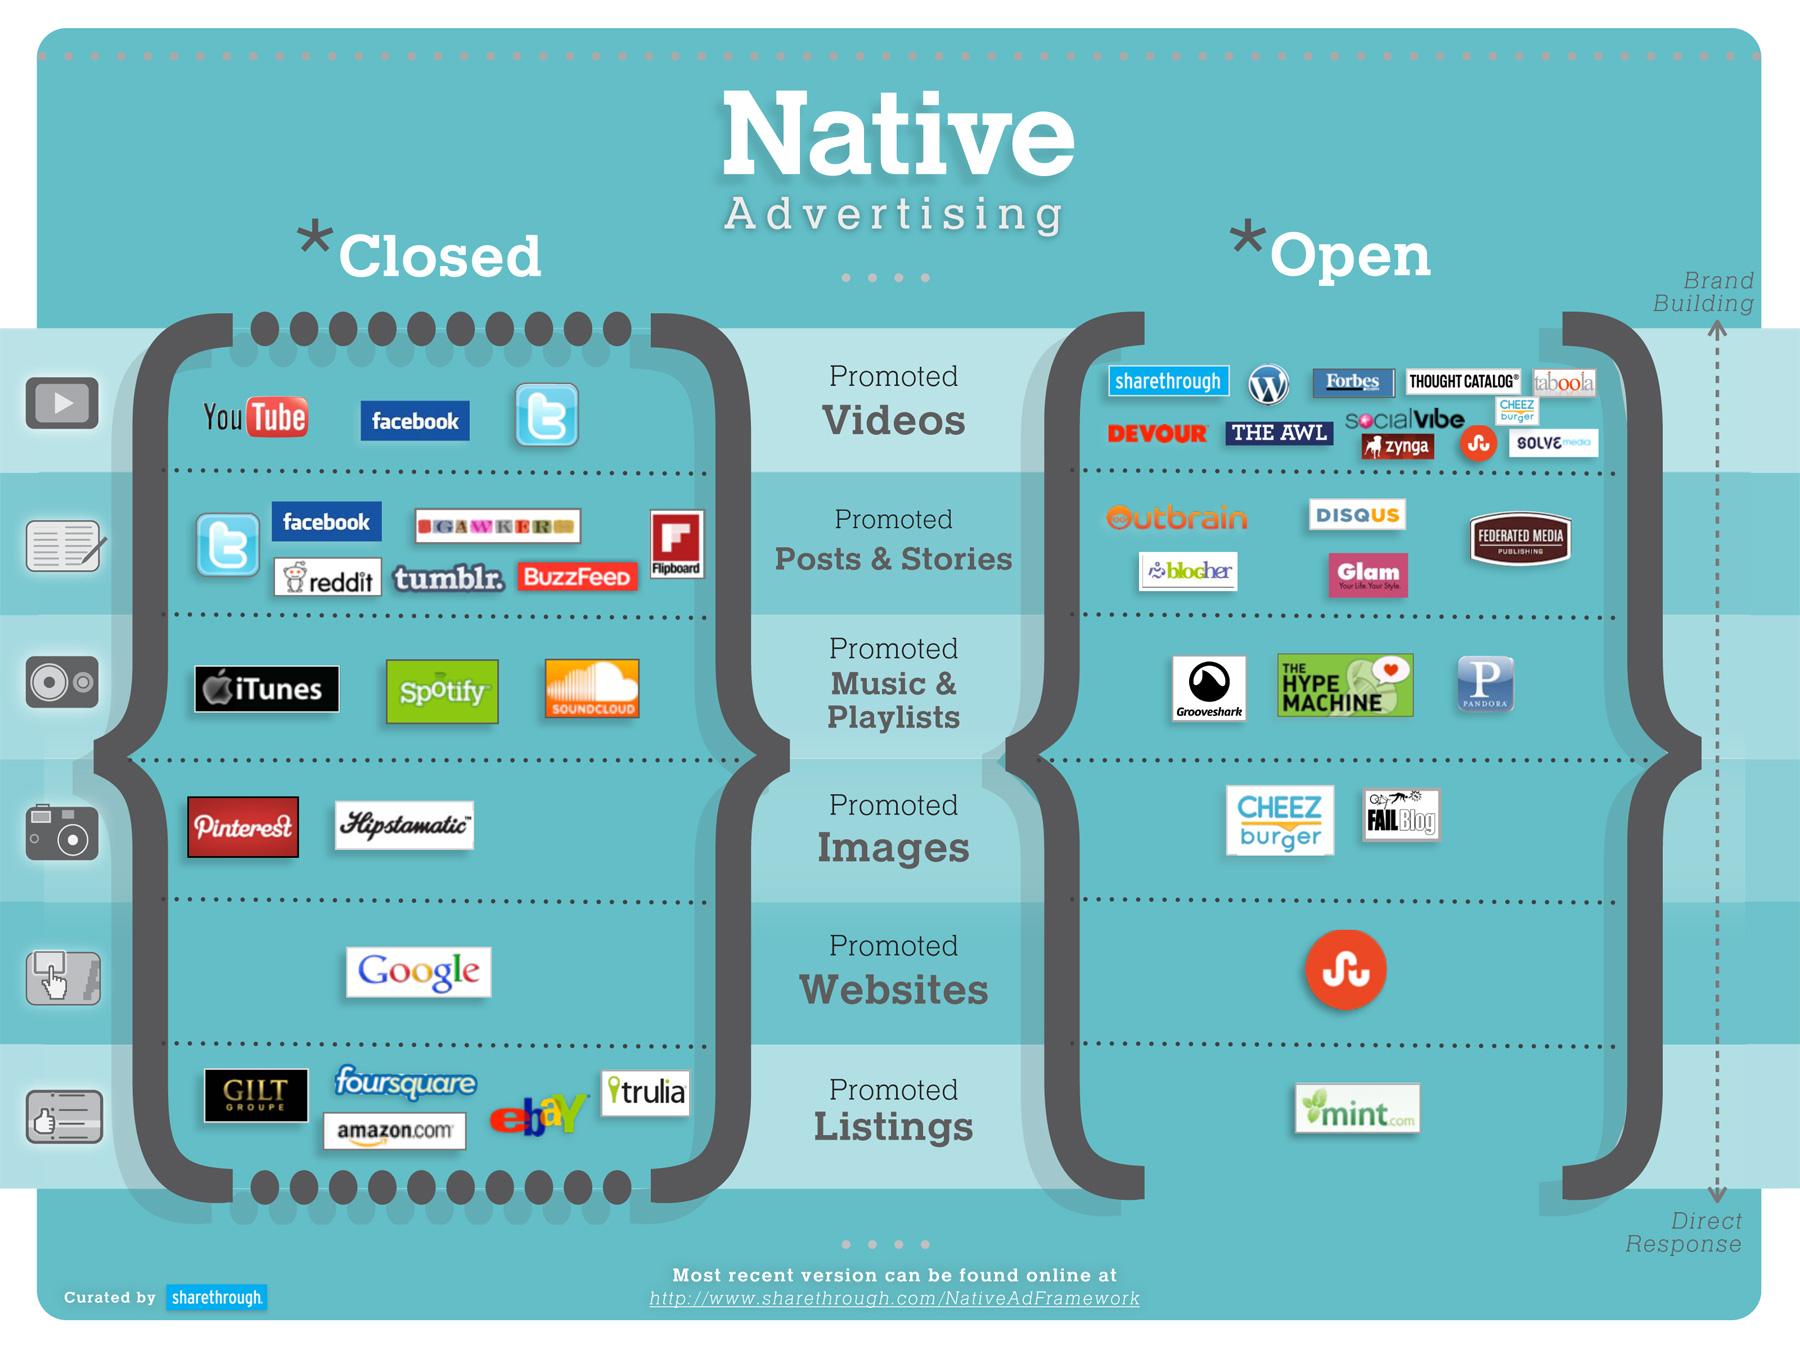 framework de publicidad nativa